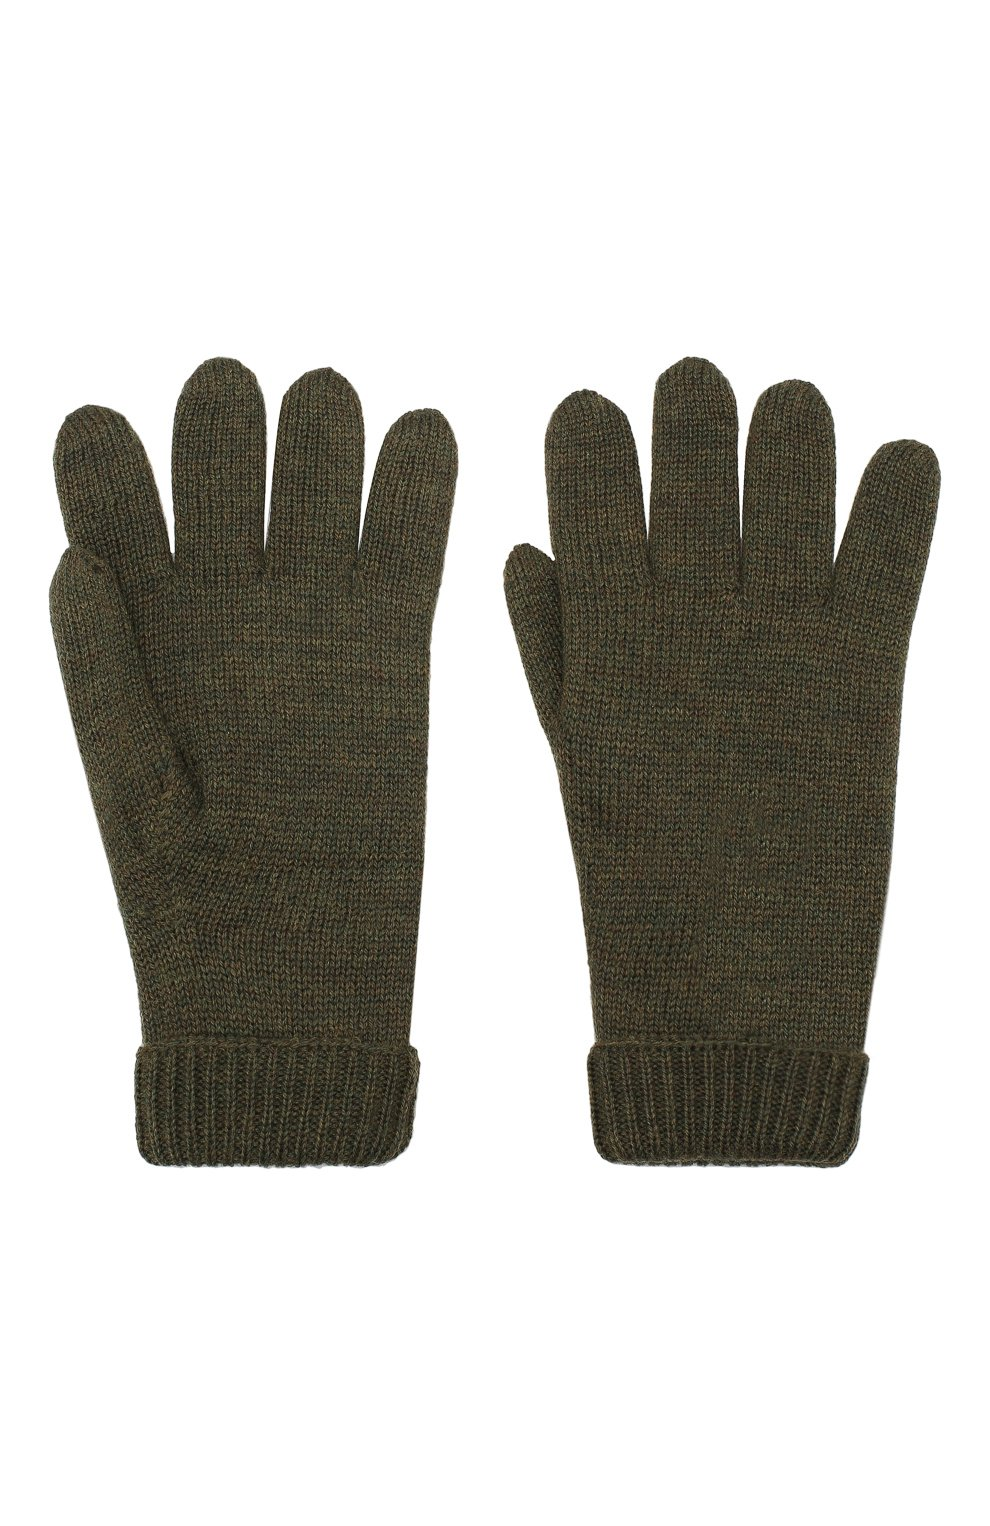 Детские шерстяные перчатки IL TRENINO хаки цвета, арт. 19 9008/E0 | Фото 2